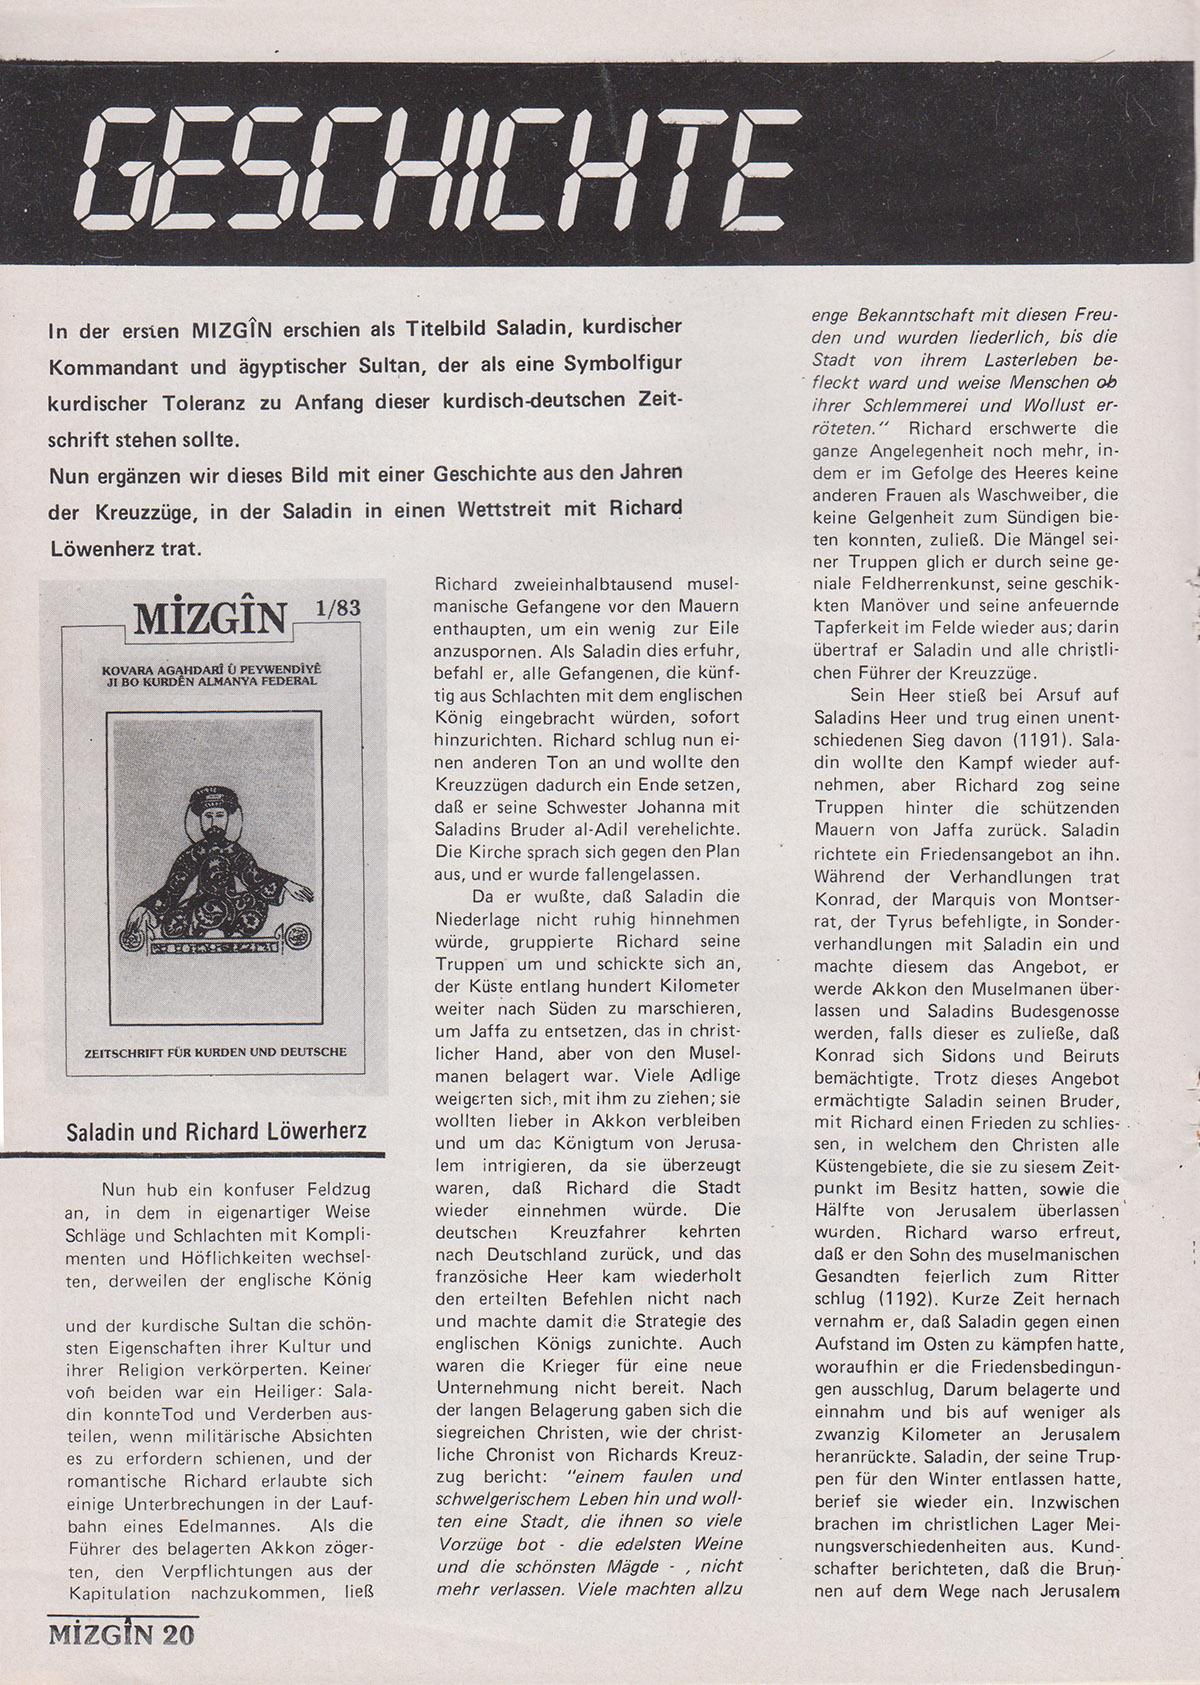 1985 Kovara Mizgin 1 85 Yekta Uzunoglu